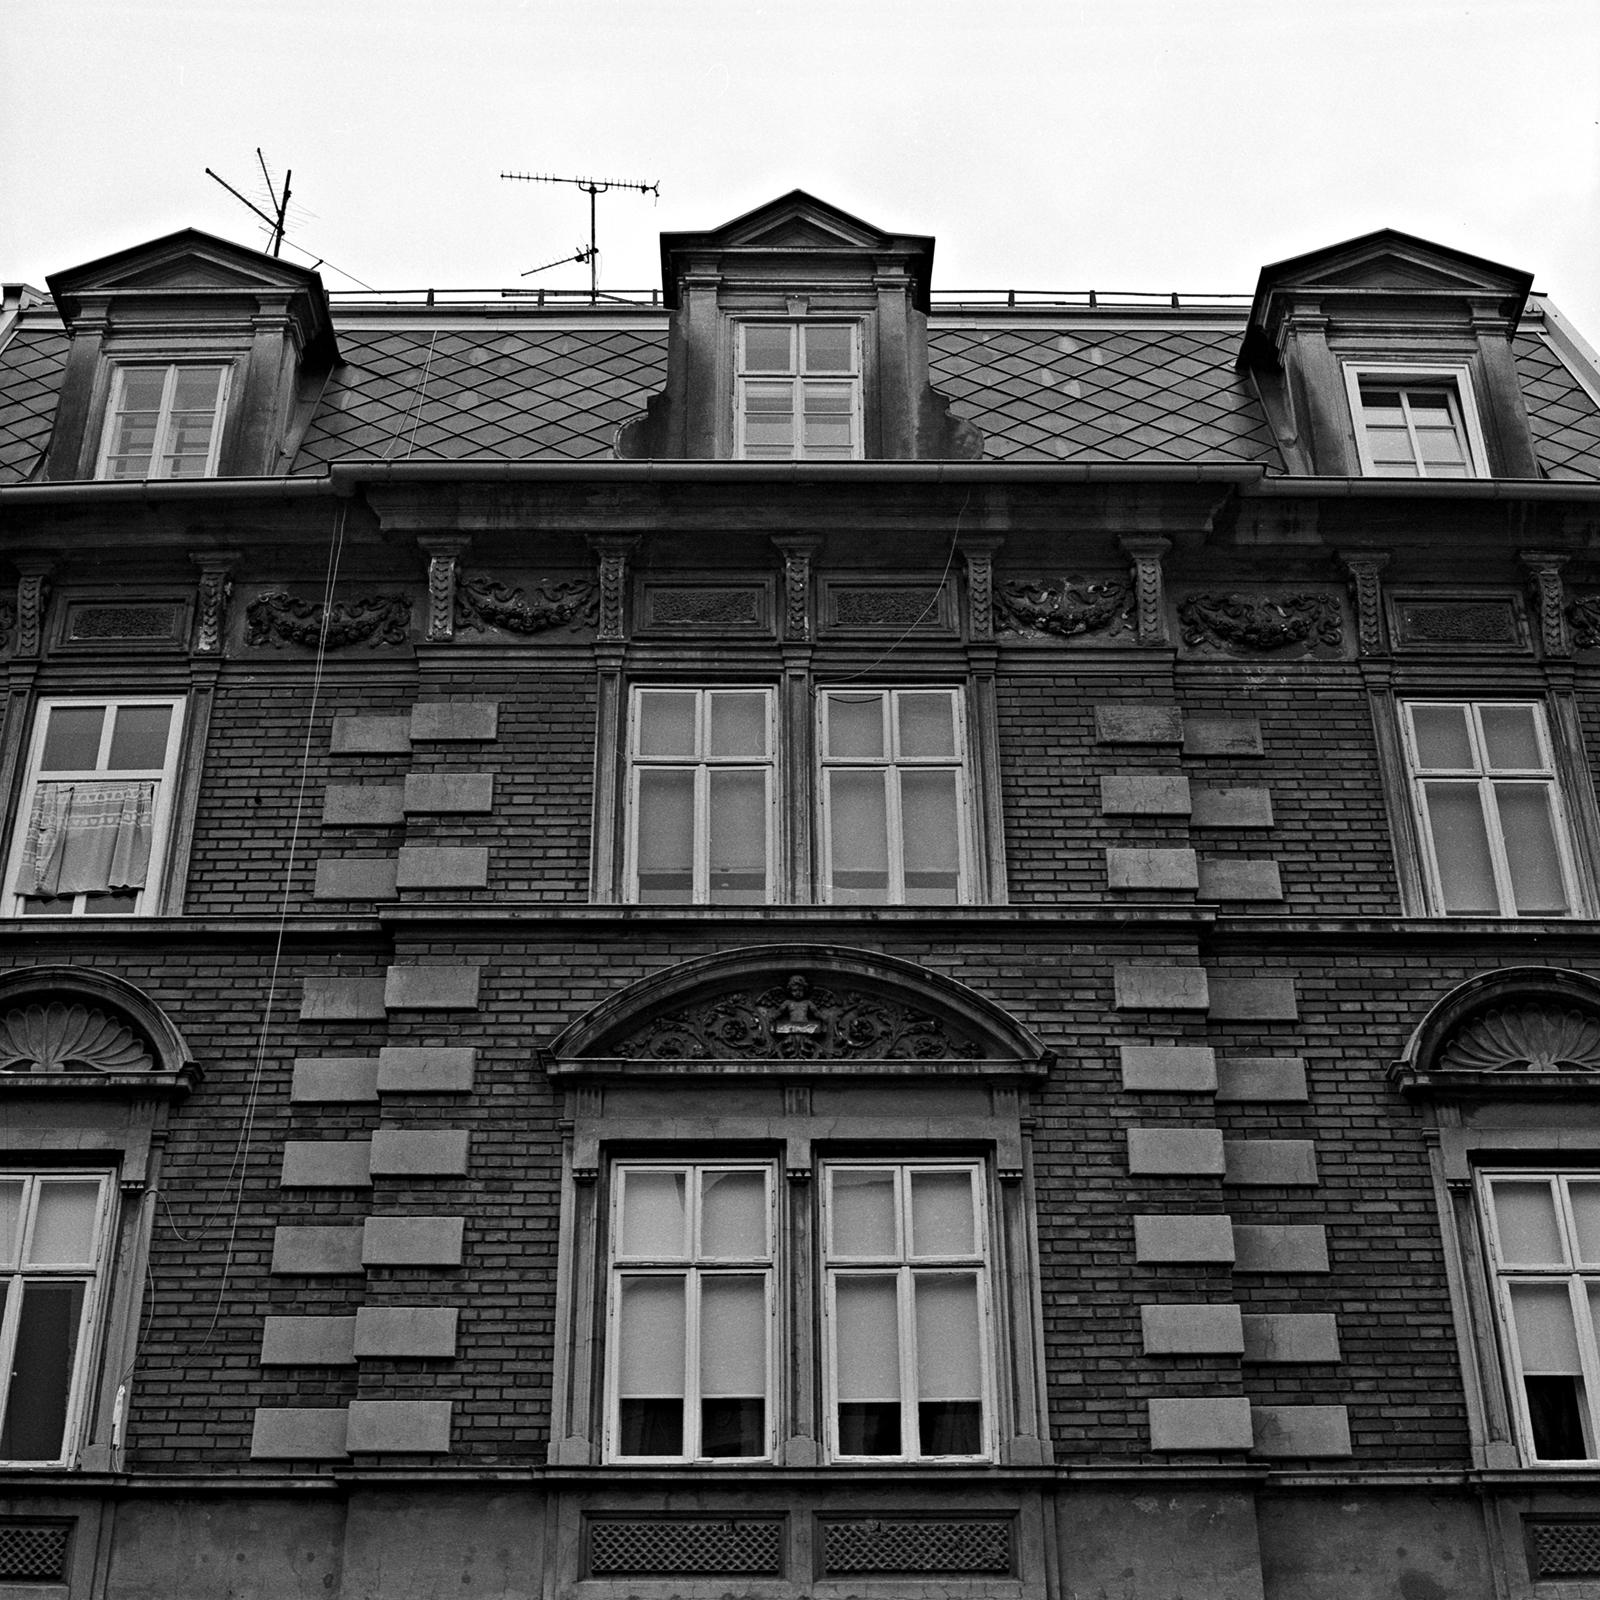 Ljubljana-r15-009.jpg